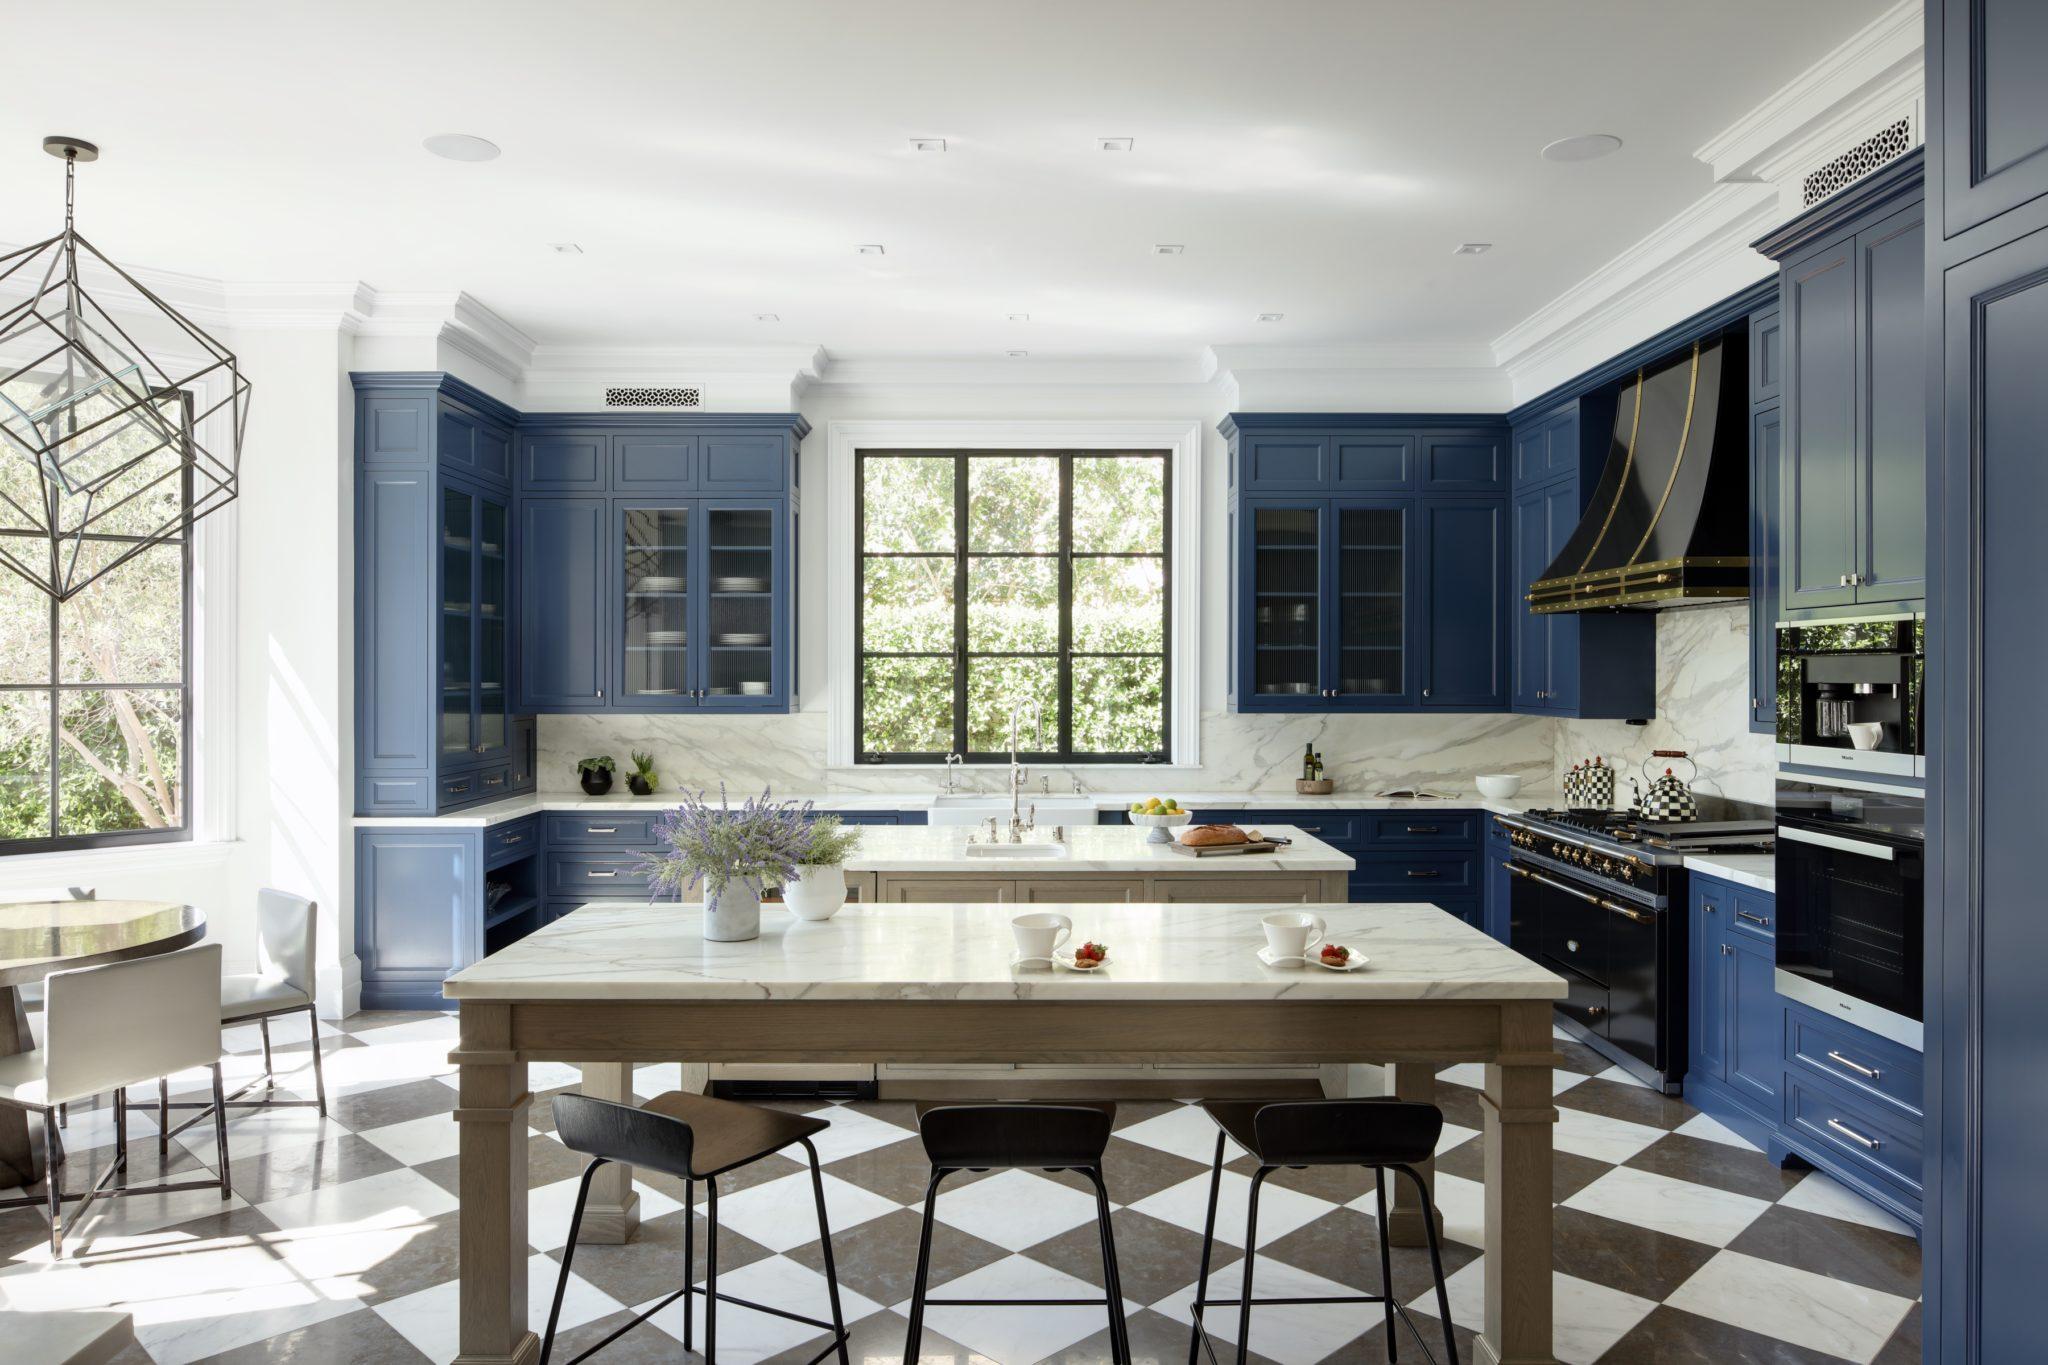 Maison Dunand Beverly Hillsby Richard Manion Architecture Inc.